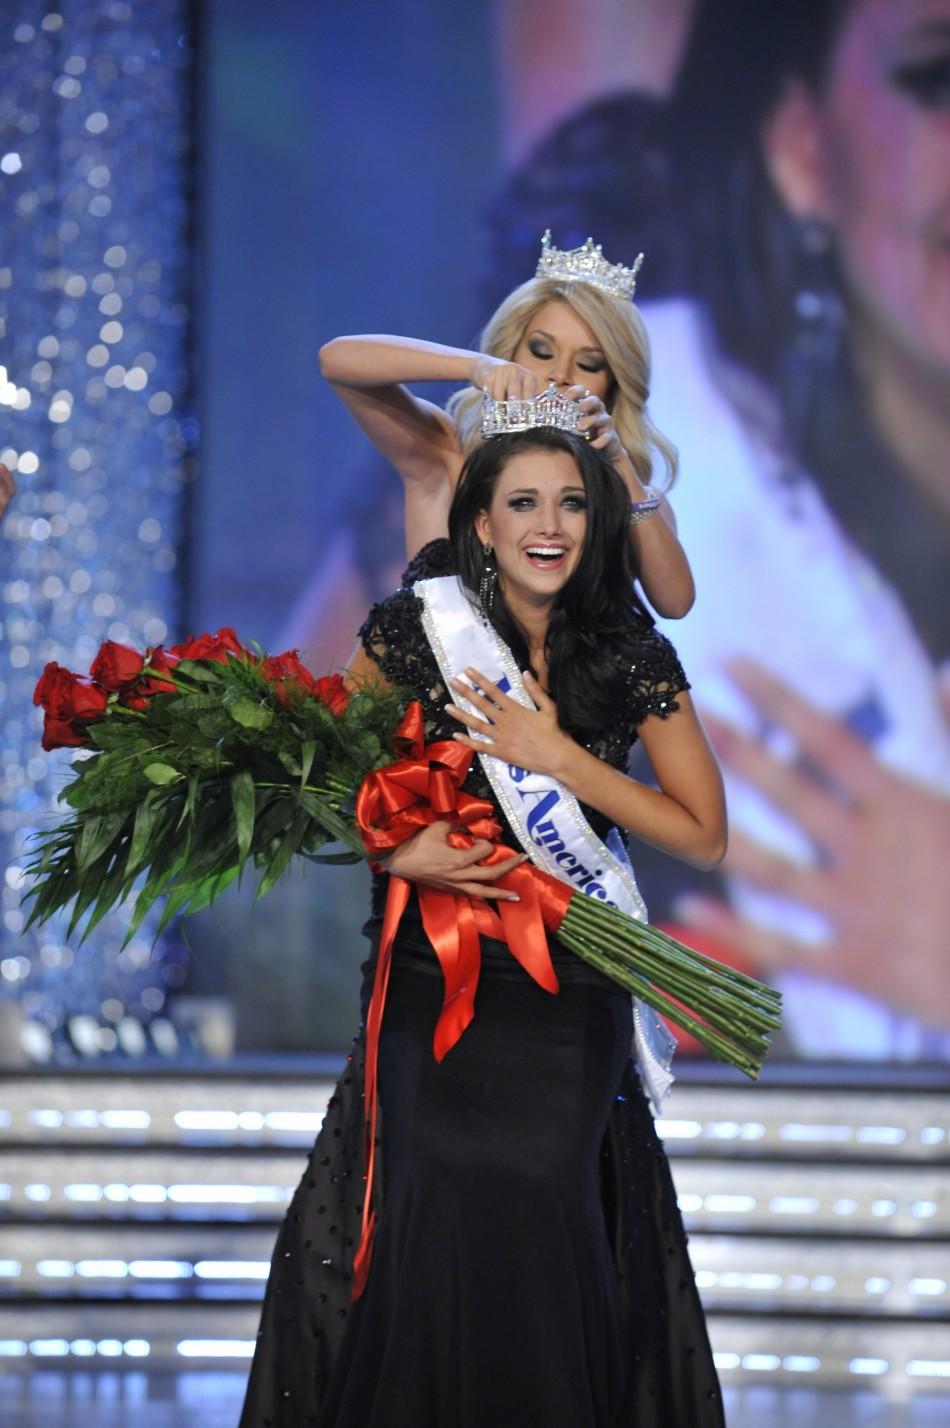 Miss America 2012 Laura Kaeppeler Reacts After Crowned Winner